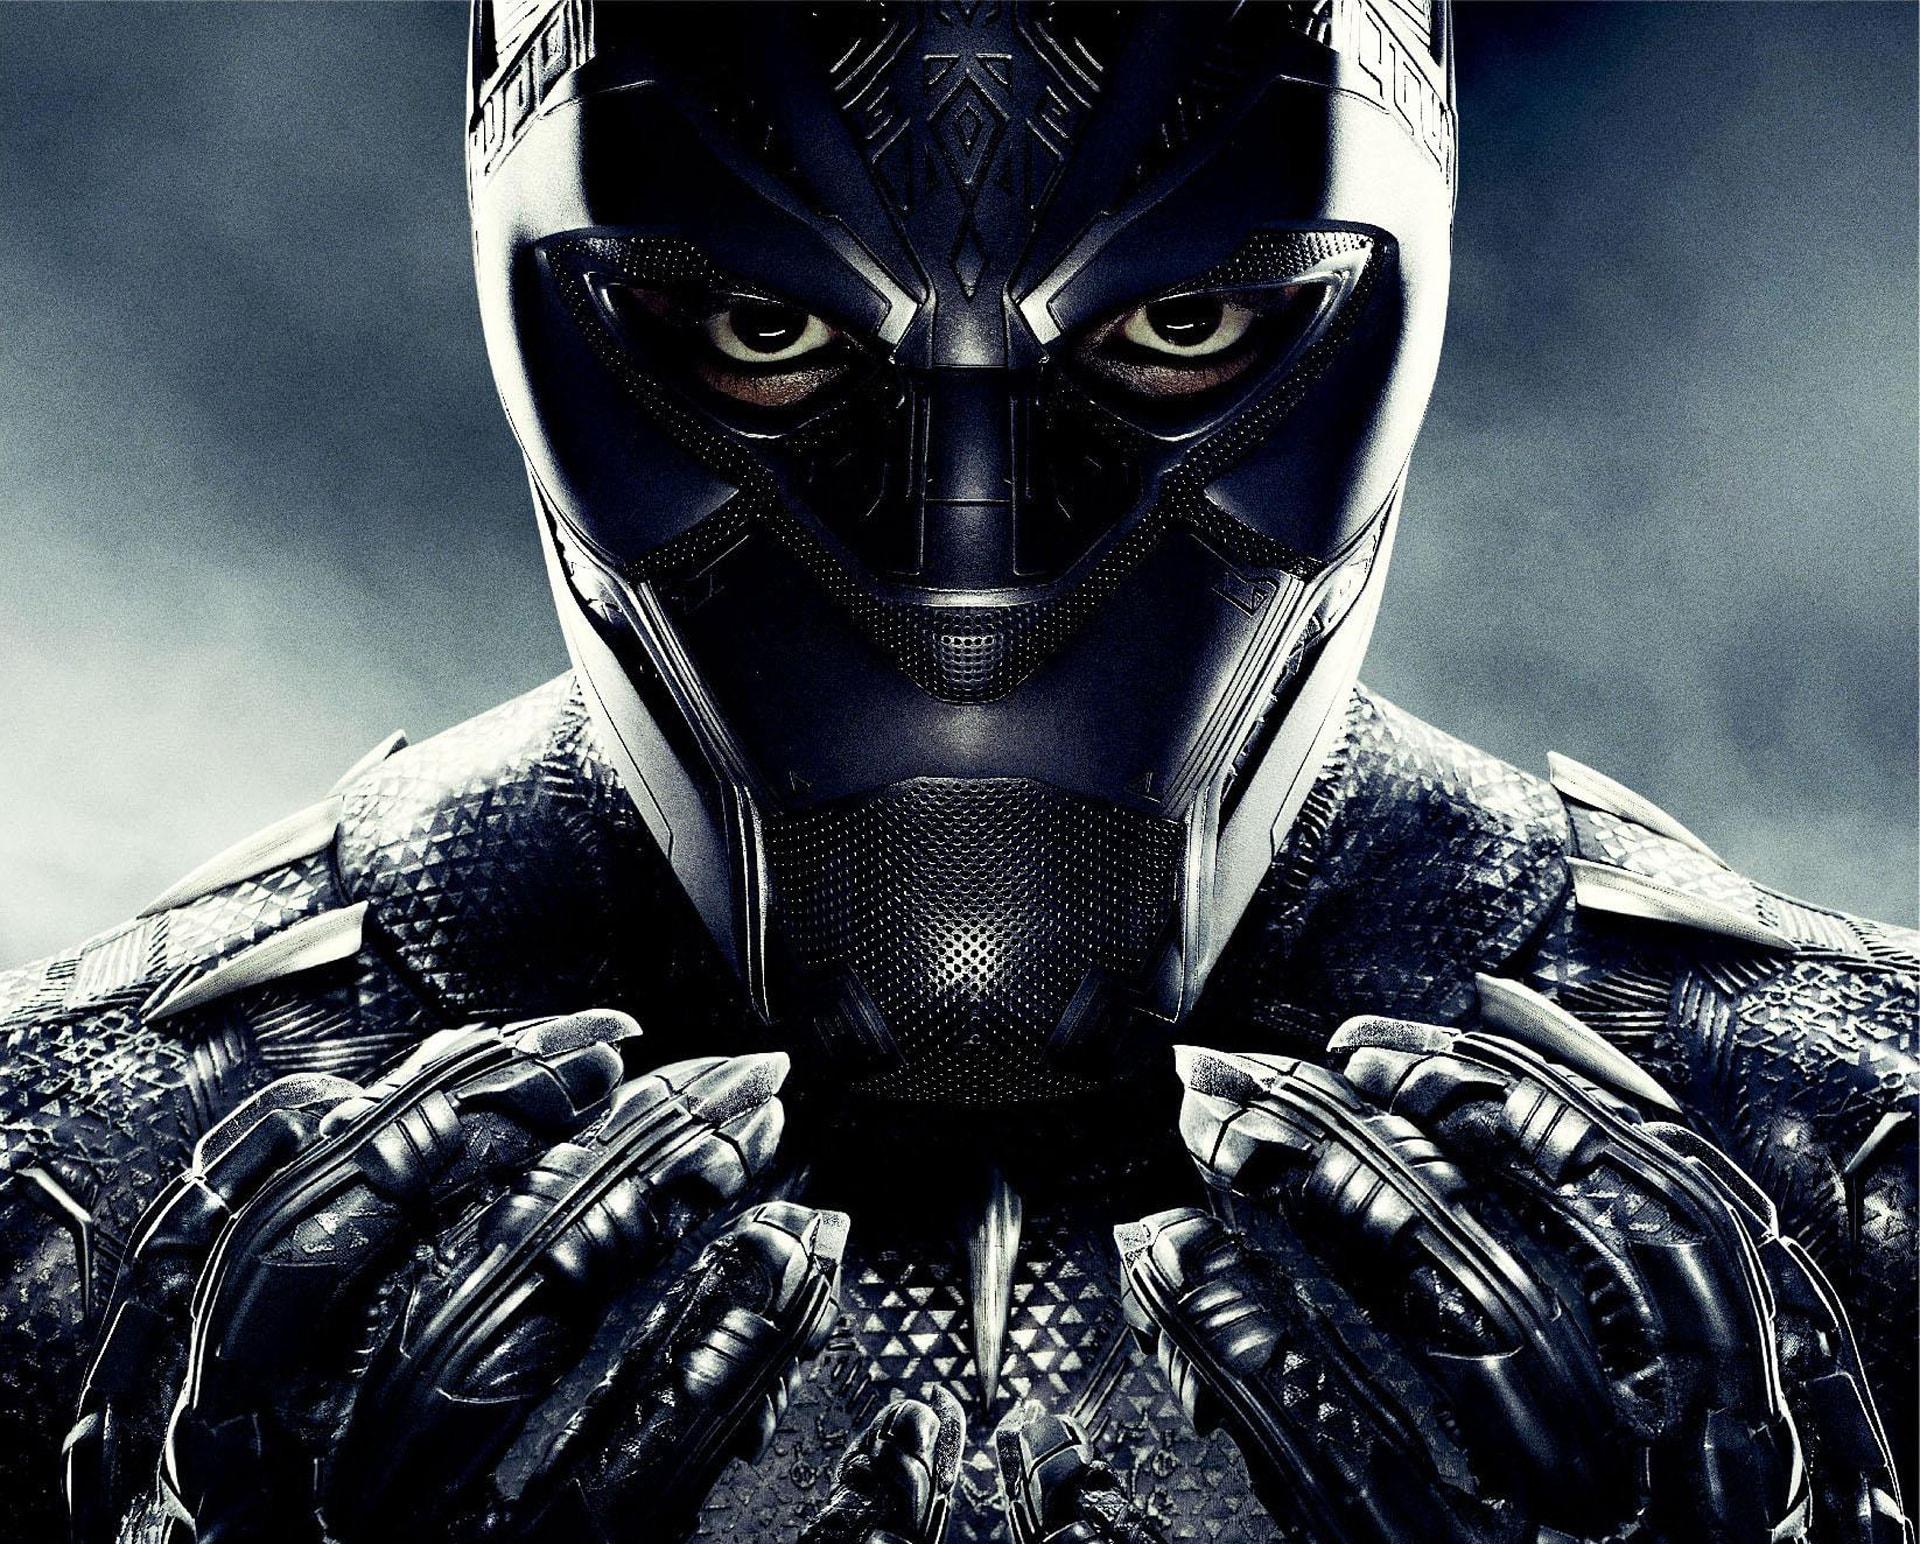 Black Panther Movie Hd Wallpaper